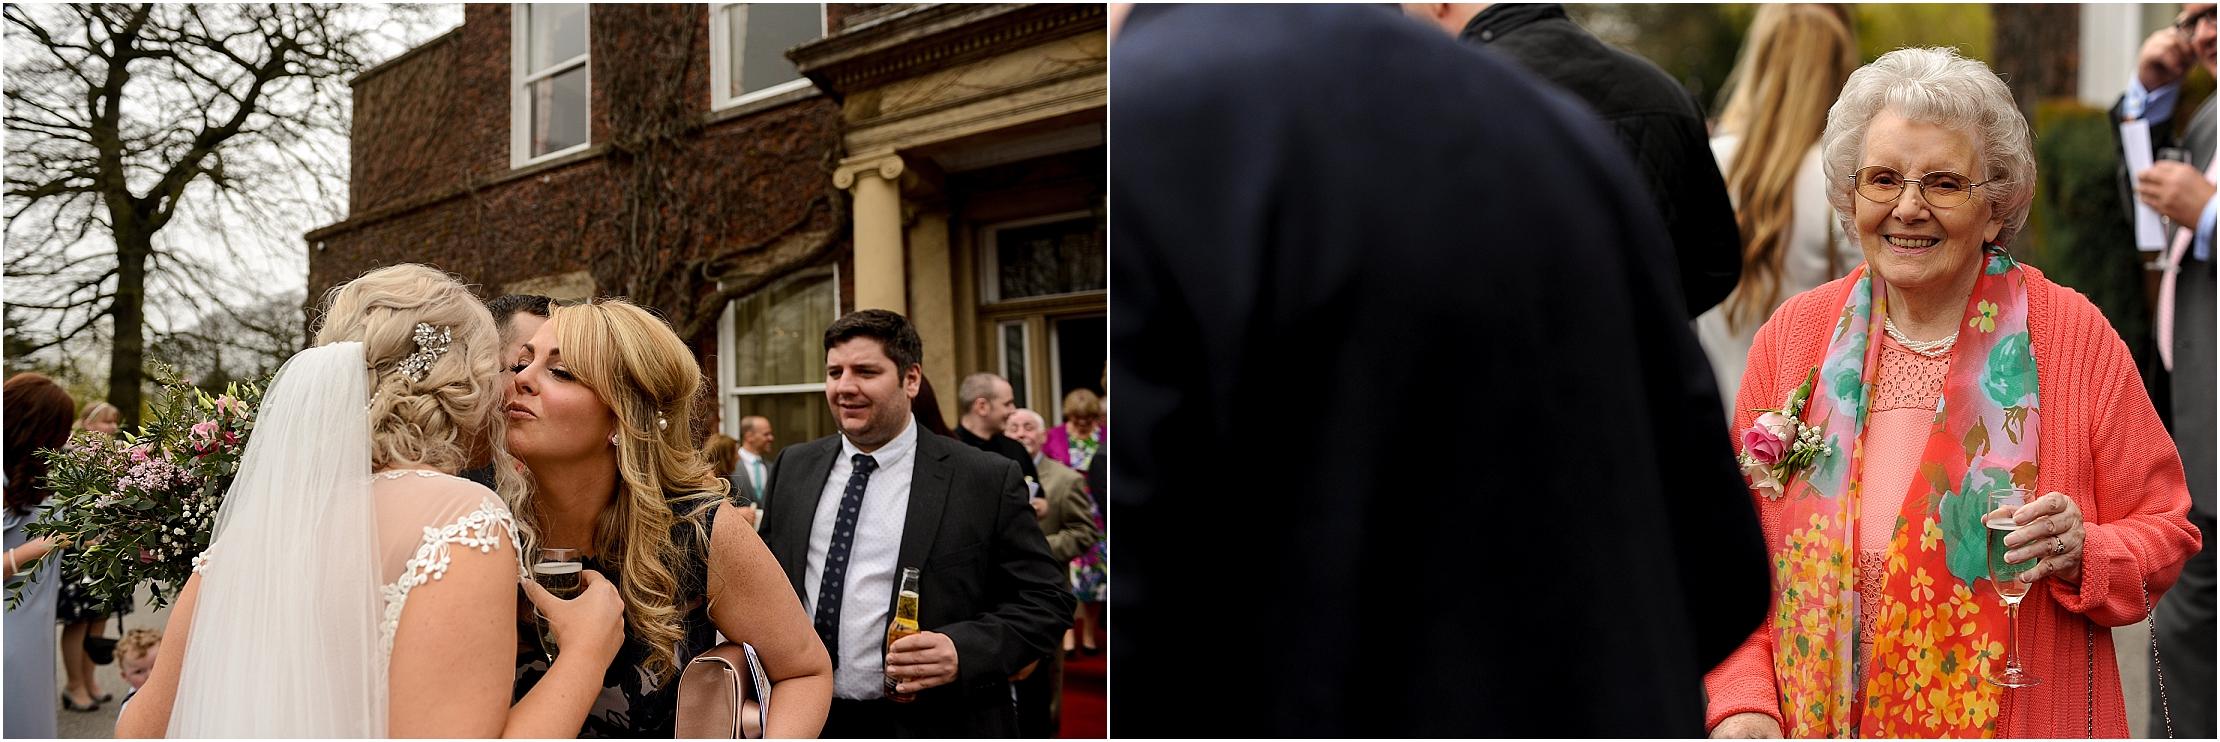 farington-lodge-wedding-44.jpg